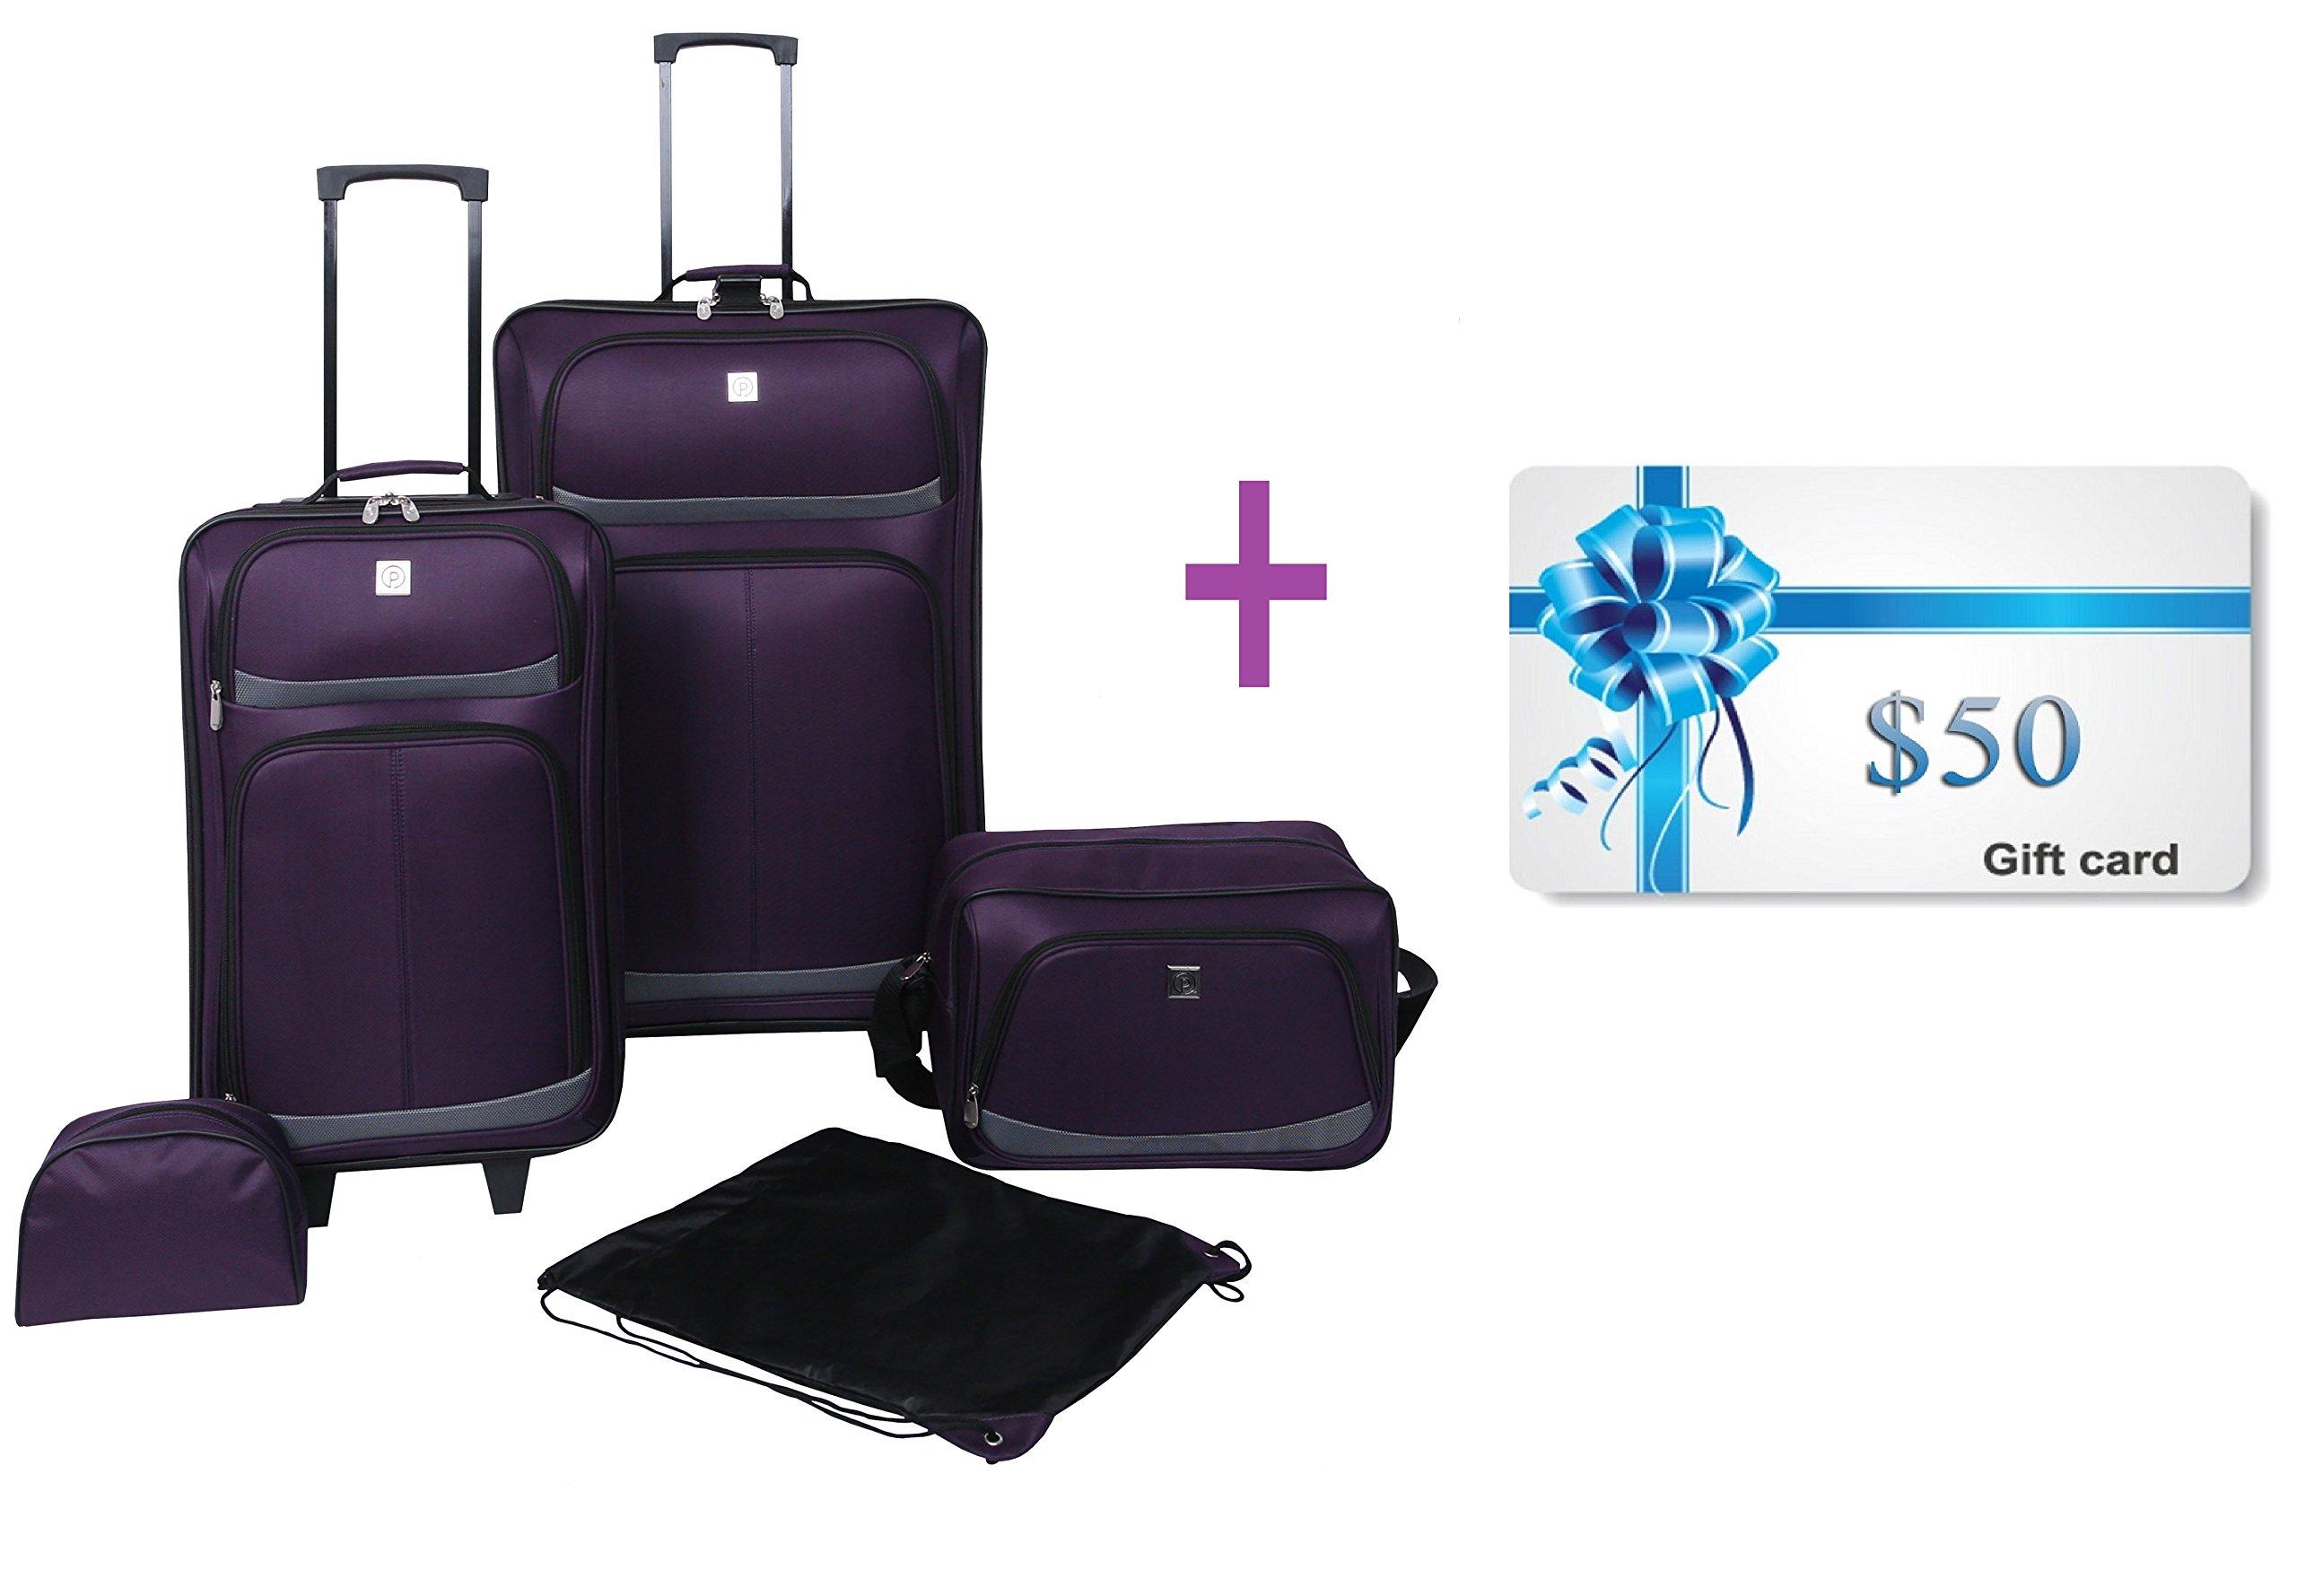 Protege 5 Piece Luggage Set for Women & Men Upright Rolling Baggage Wheels Bag